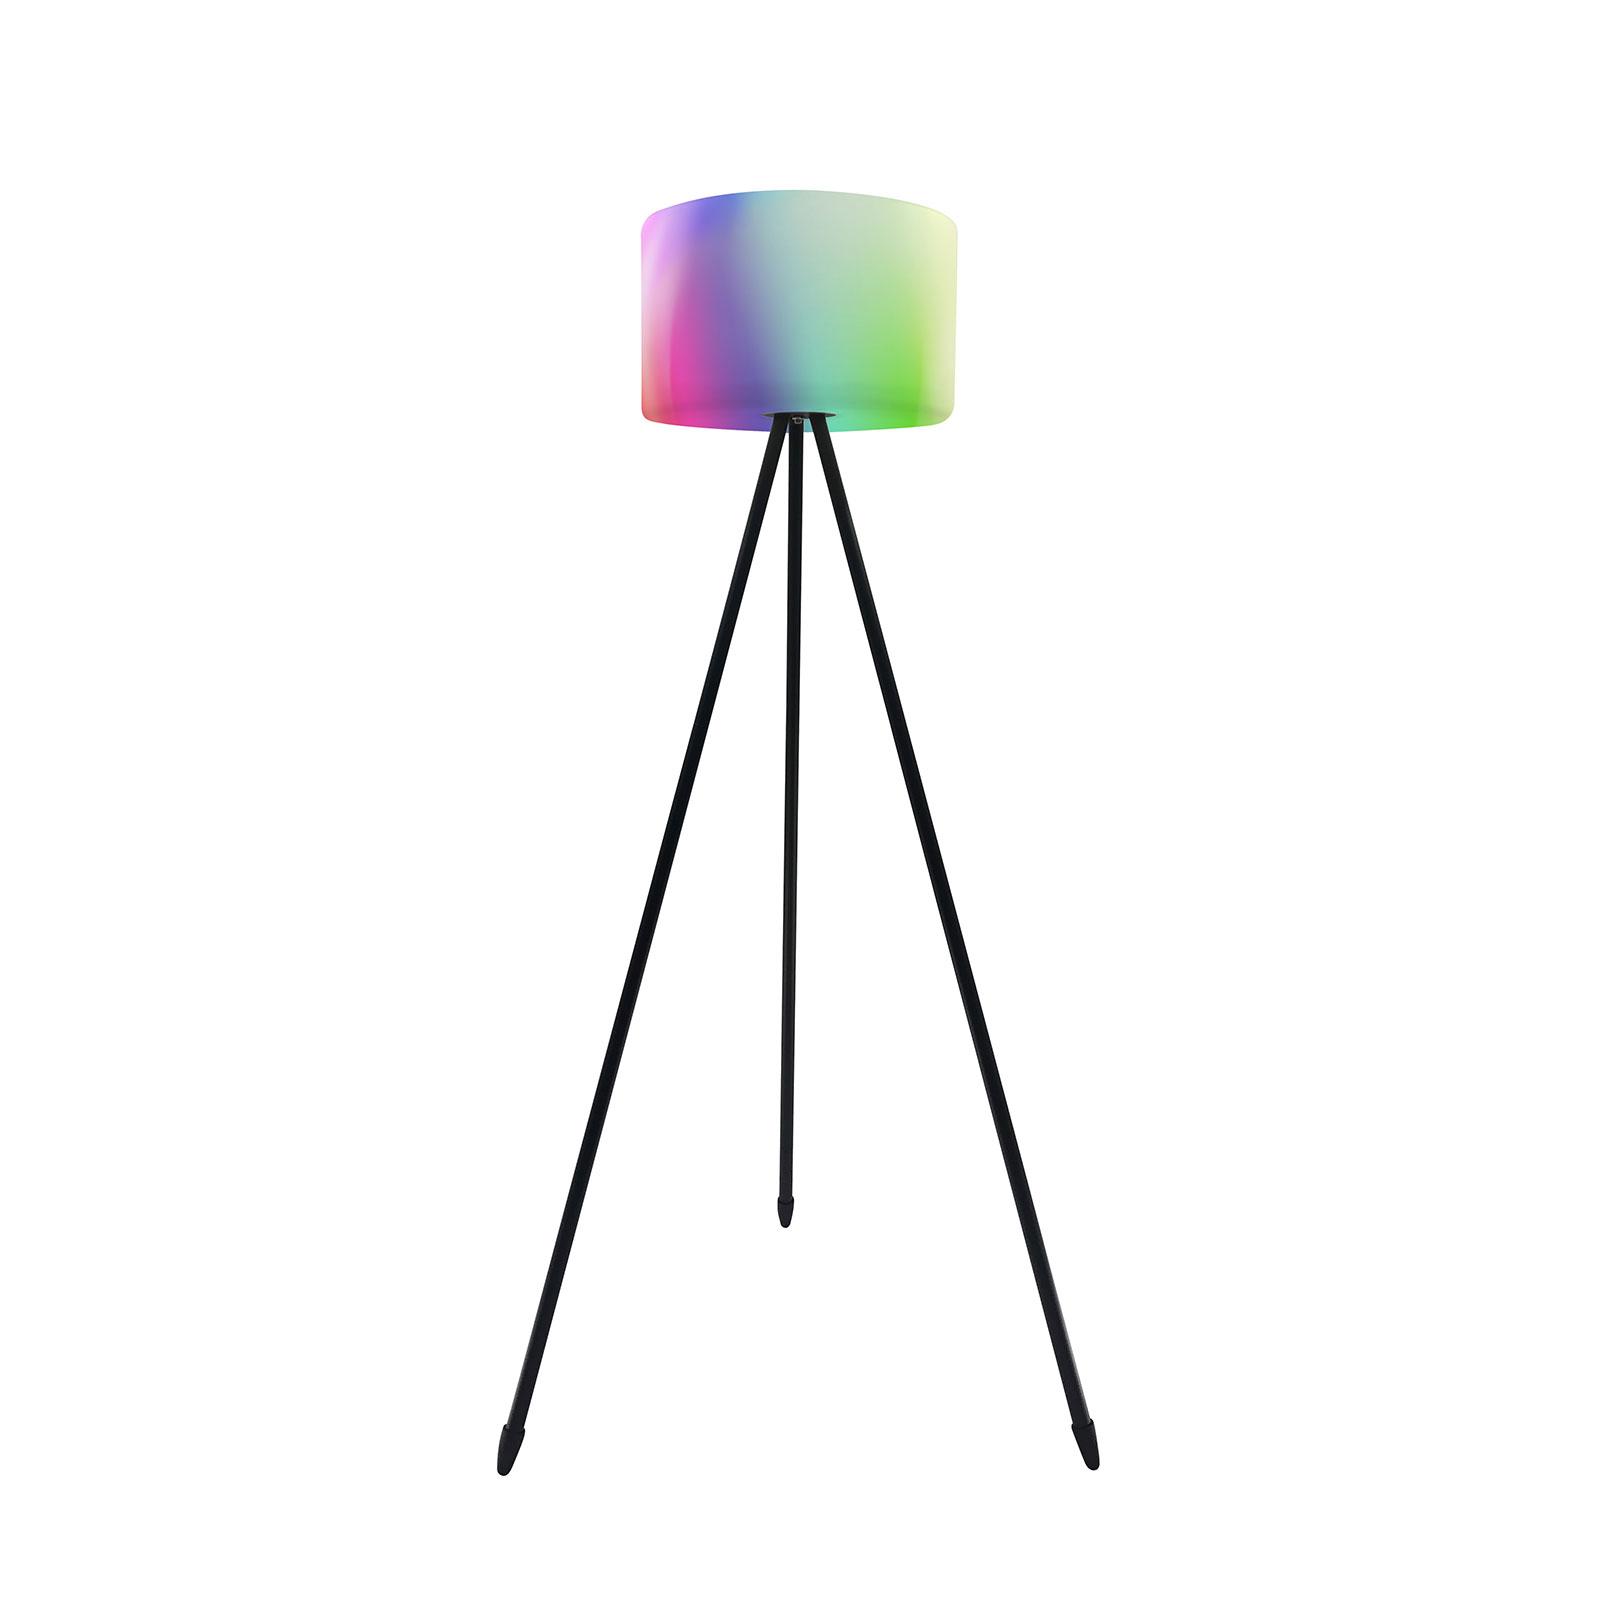 Müller Licht tint Khaya utend. LED-gulvlampe RGBW